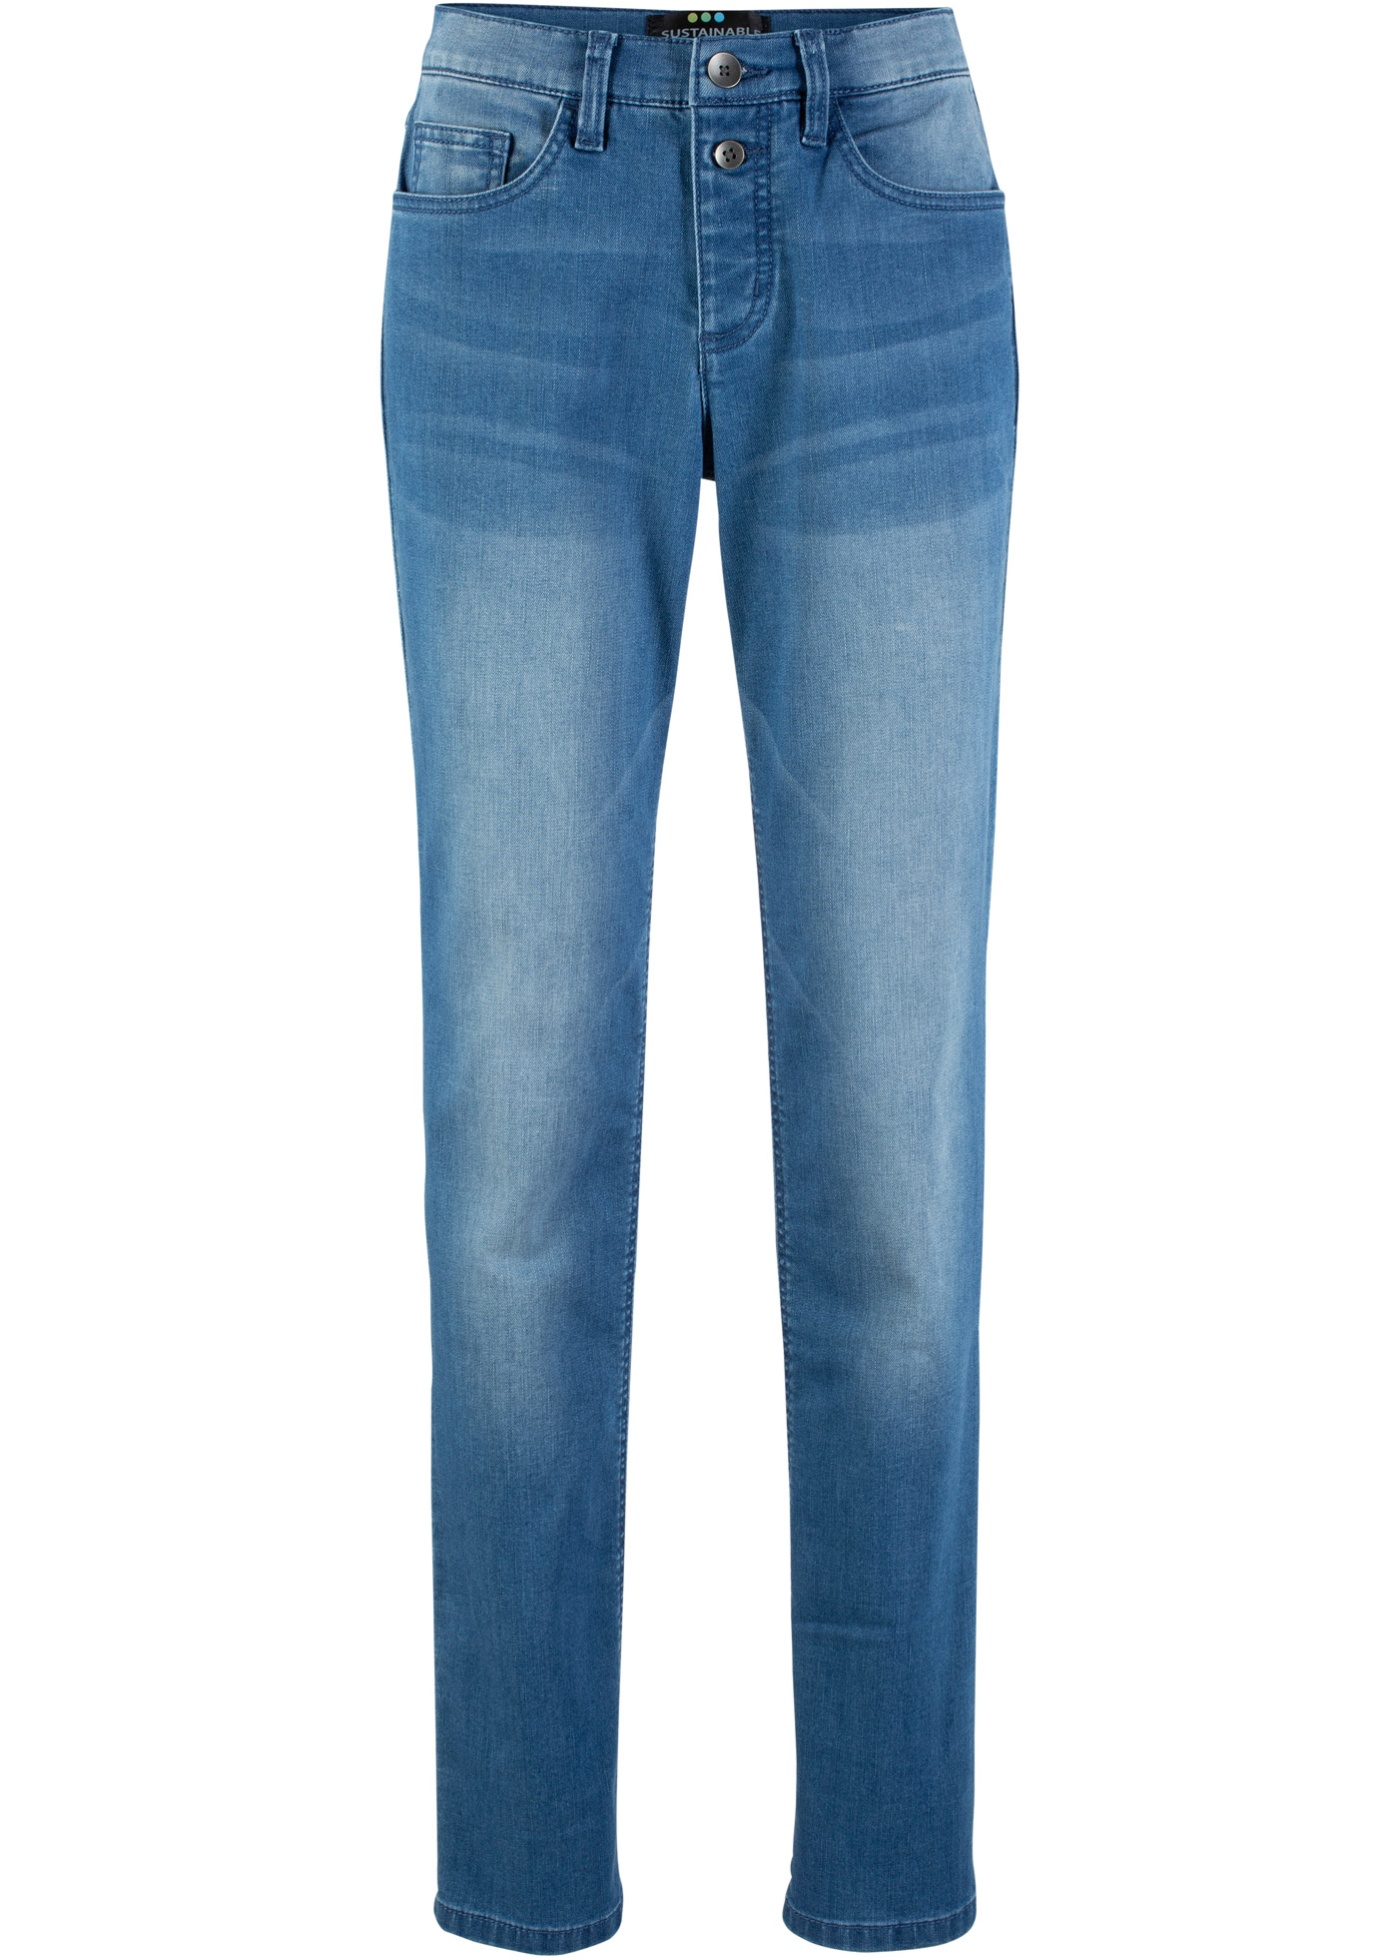 Bonprix Fit Bpc En responsable CollectionJean Polyester Bleu RecycléSlim Femme Pour Éco XuwPkiZOTl